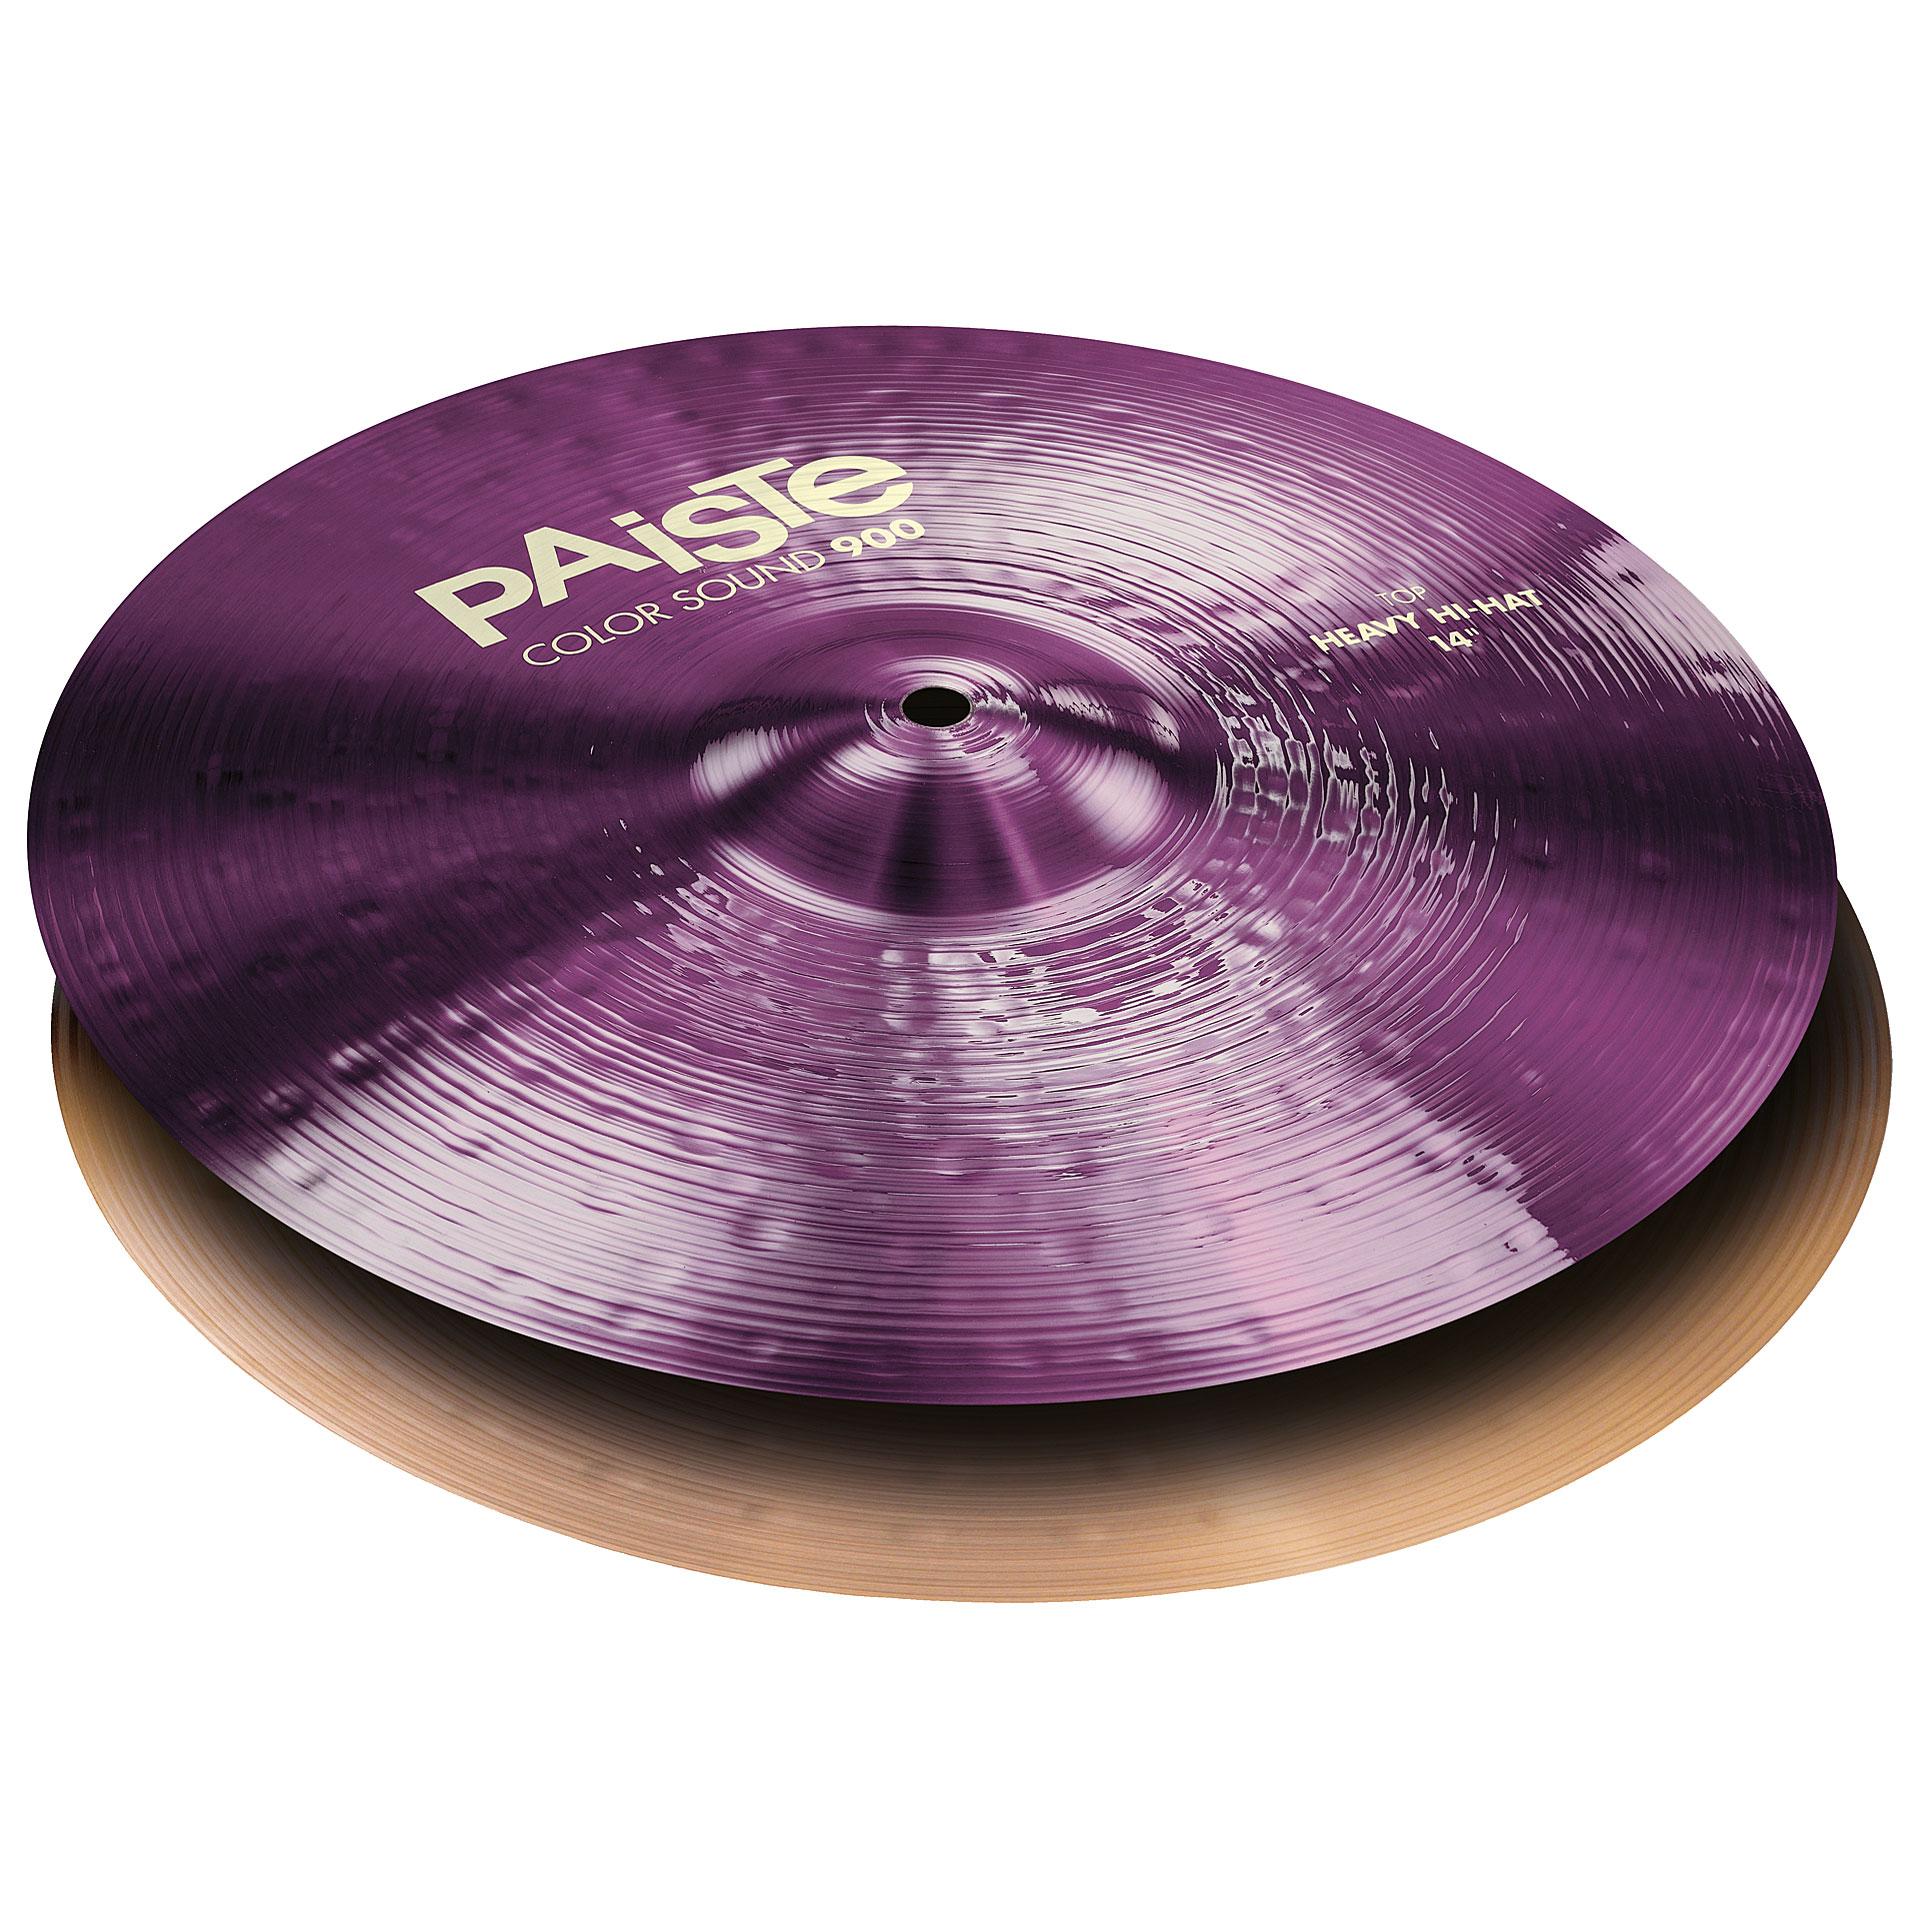 PAISTE-900CS-PUHHH14-Paiste-900-Color-Sound-Heavy-Hi-Hat-14-Purple-sku-610005183